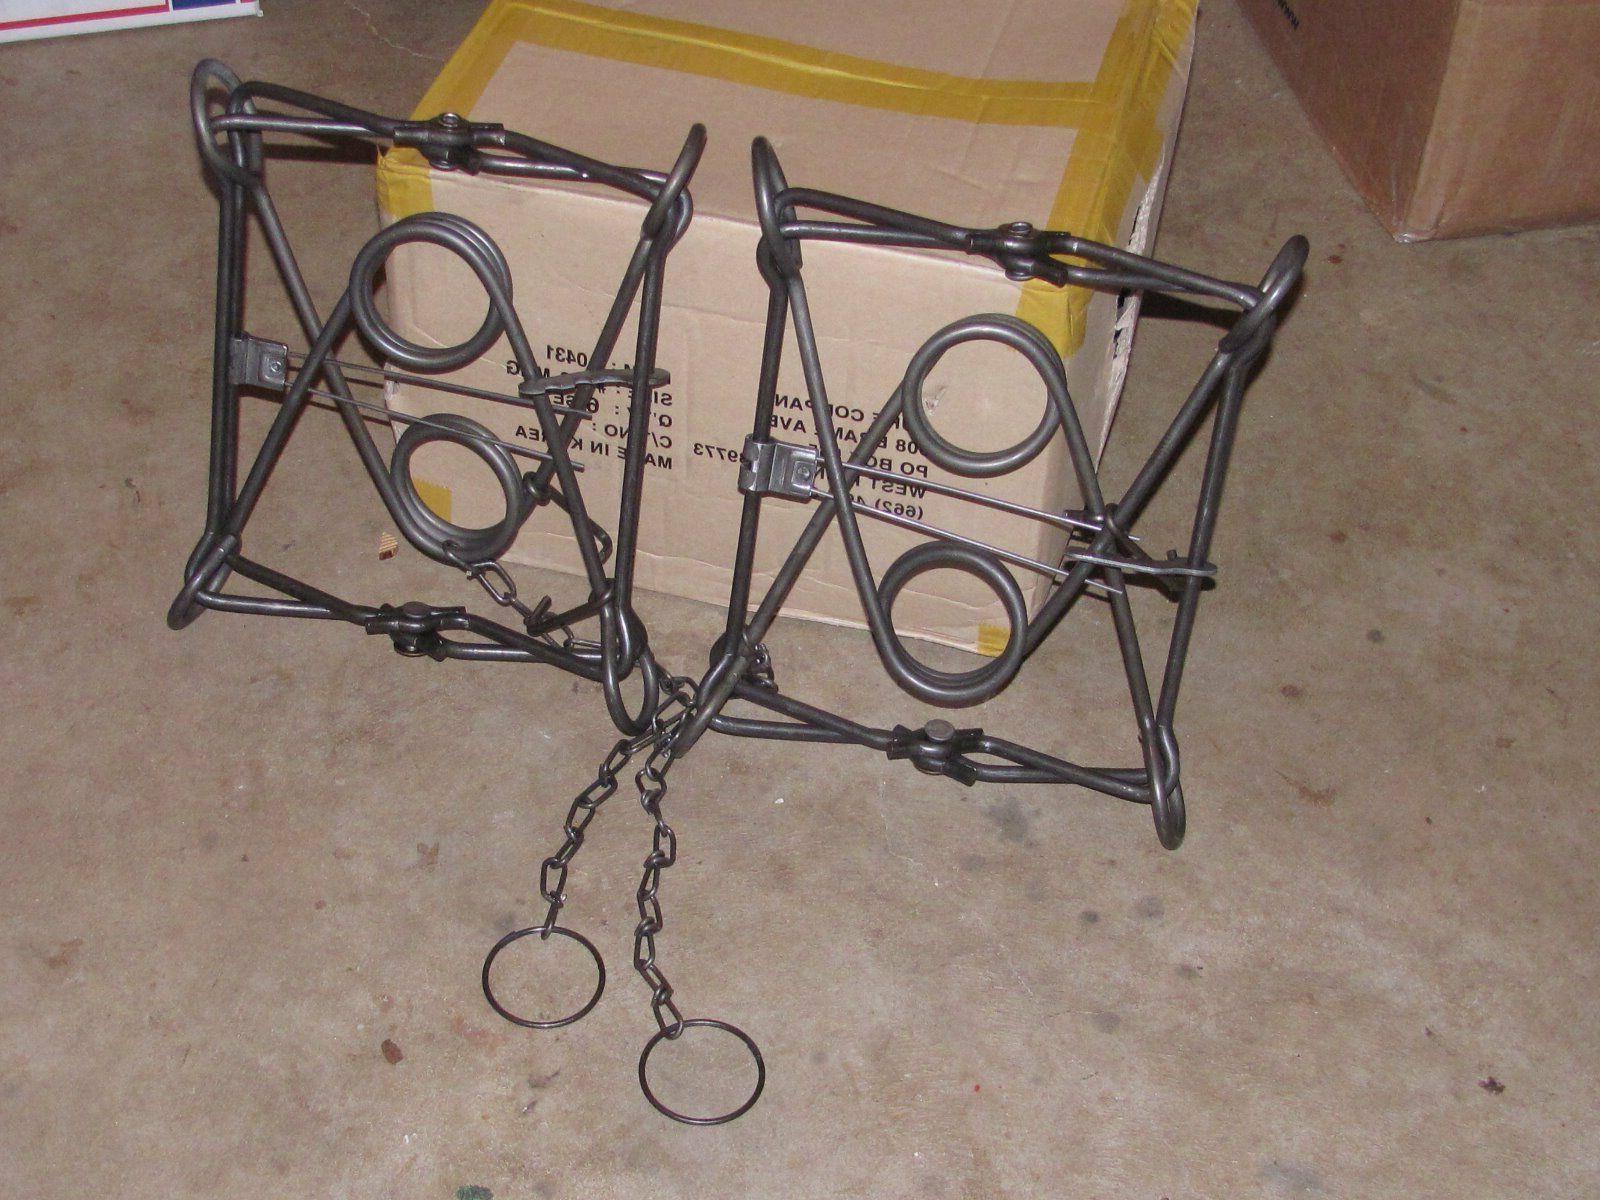 2 new 330 body traps animal body